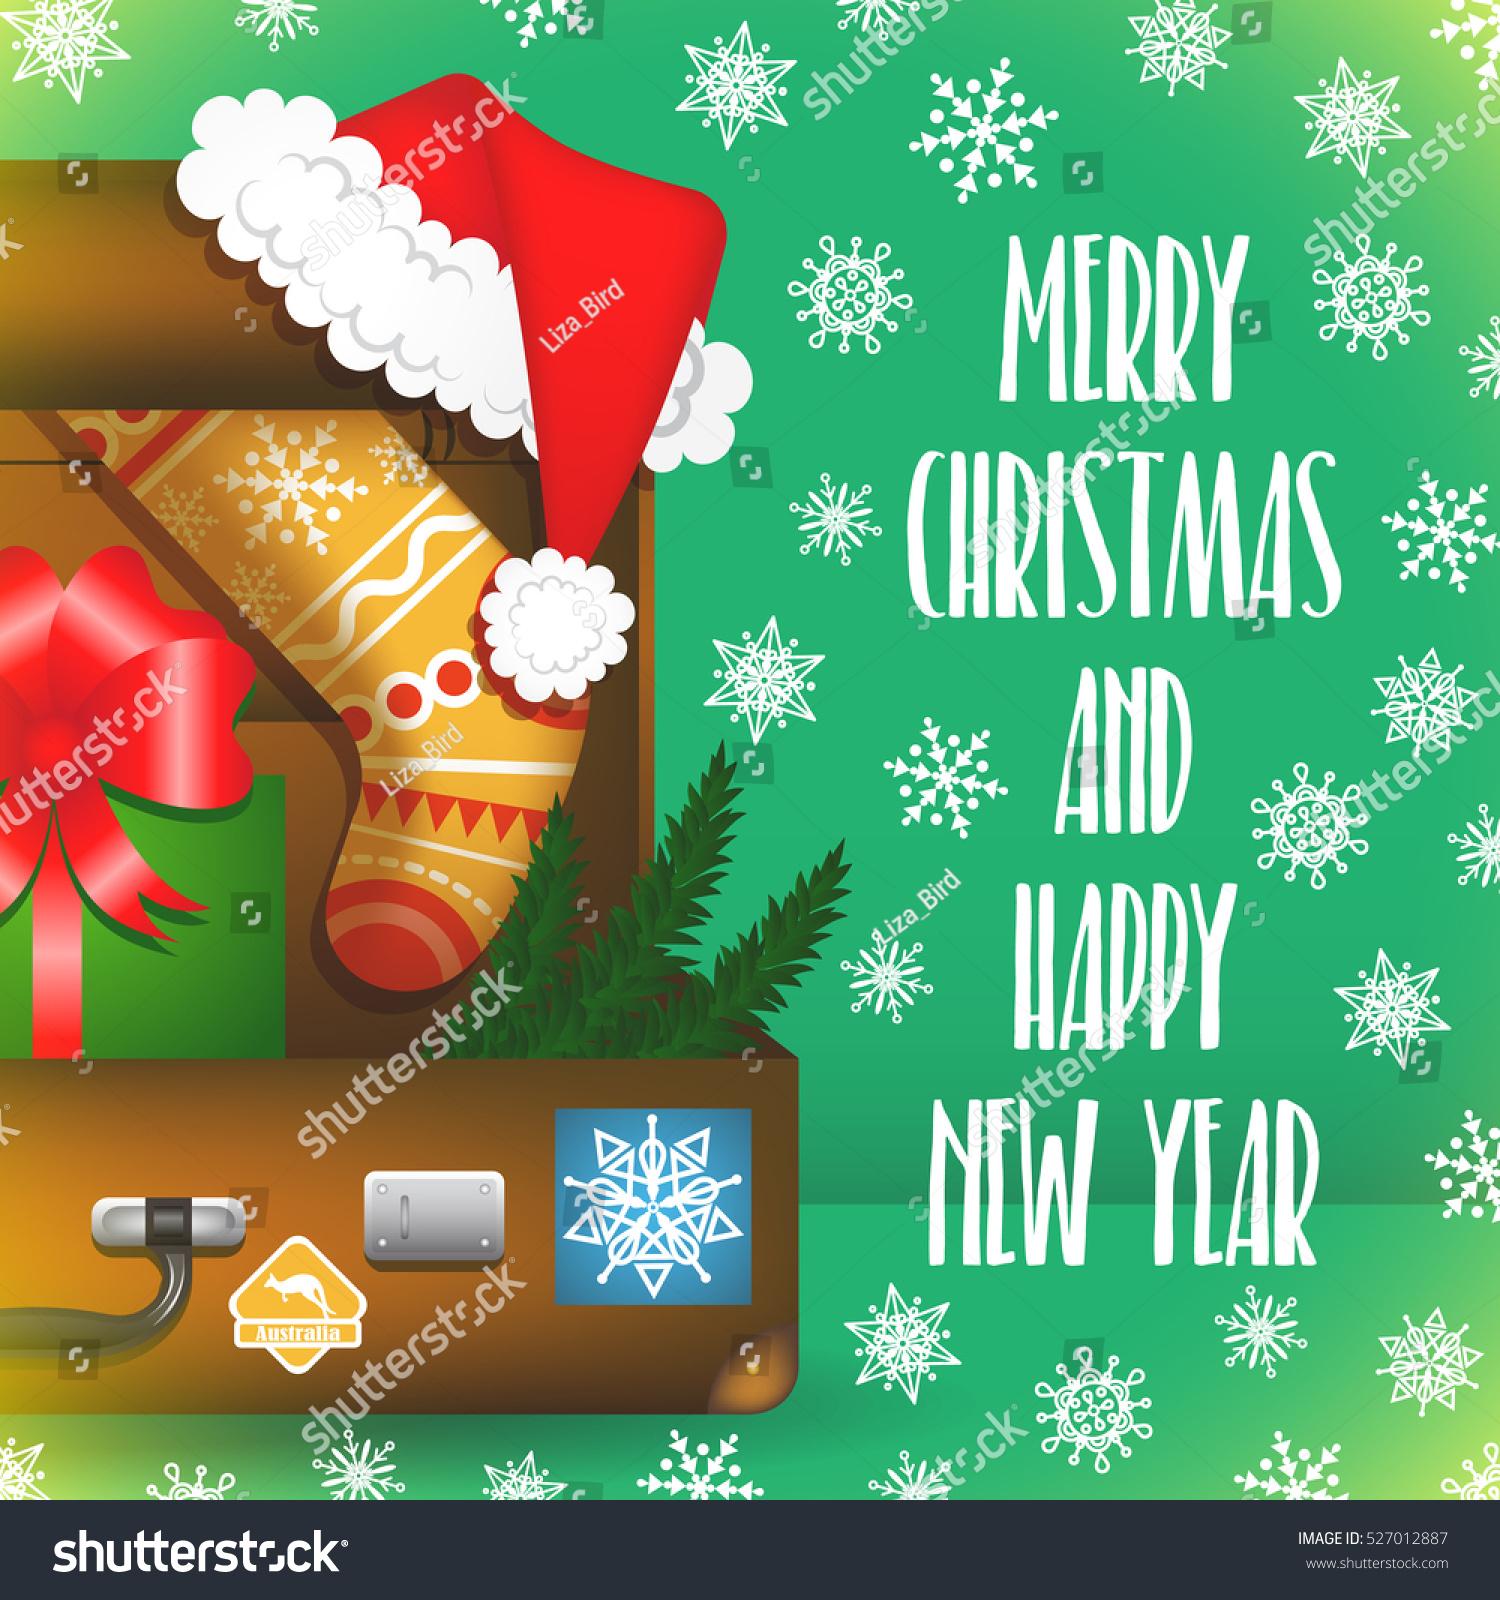 Merry Christmas Card Snowflakes Santa Claus Stock Vector Royalty